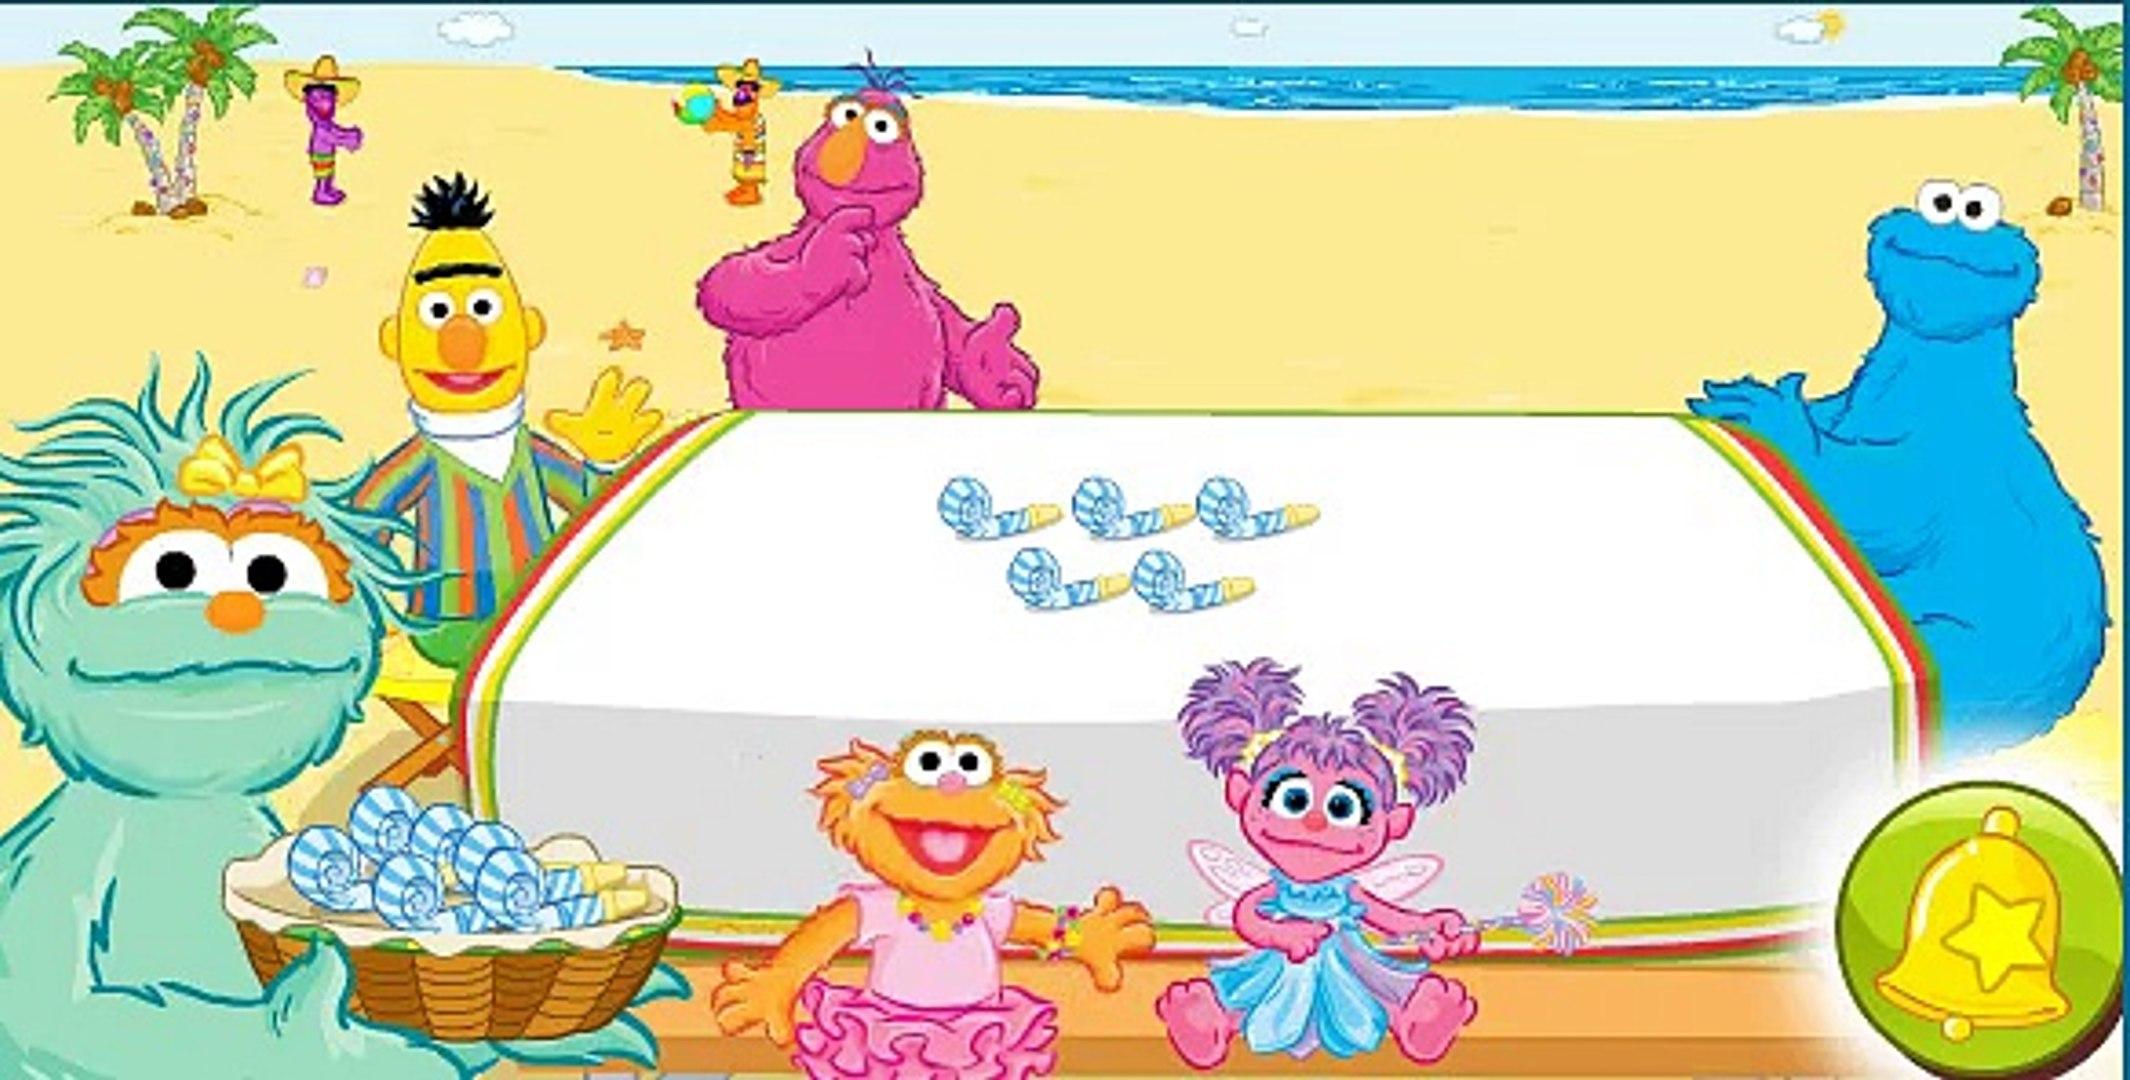 Sesame Street Rositas Fiesta Cartoon Animation Pbs Kids Dailymotion Video